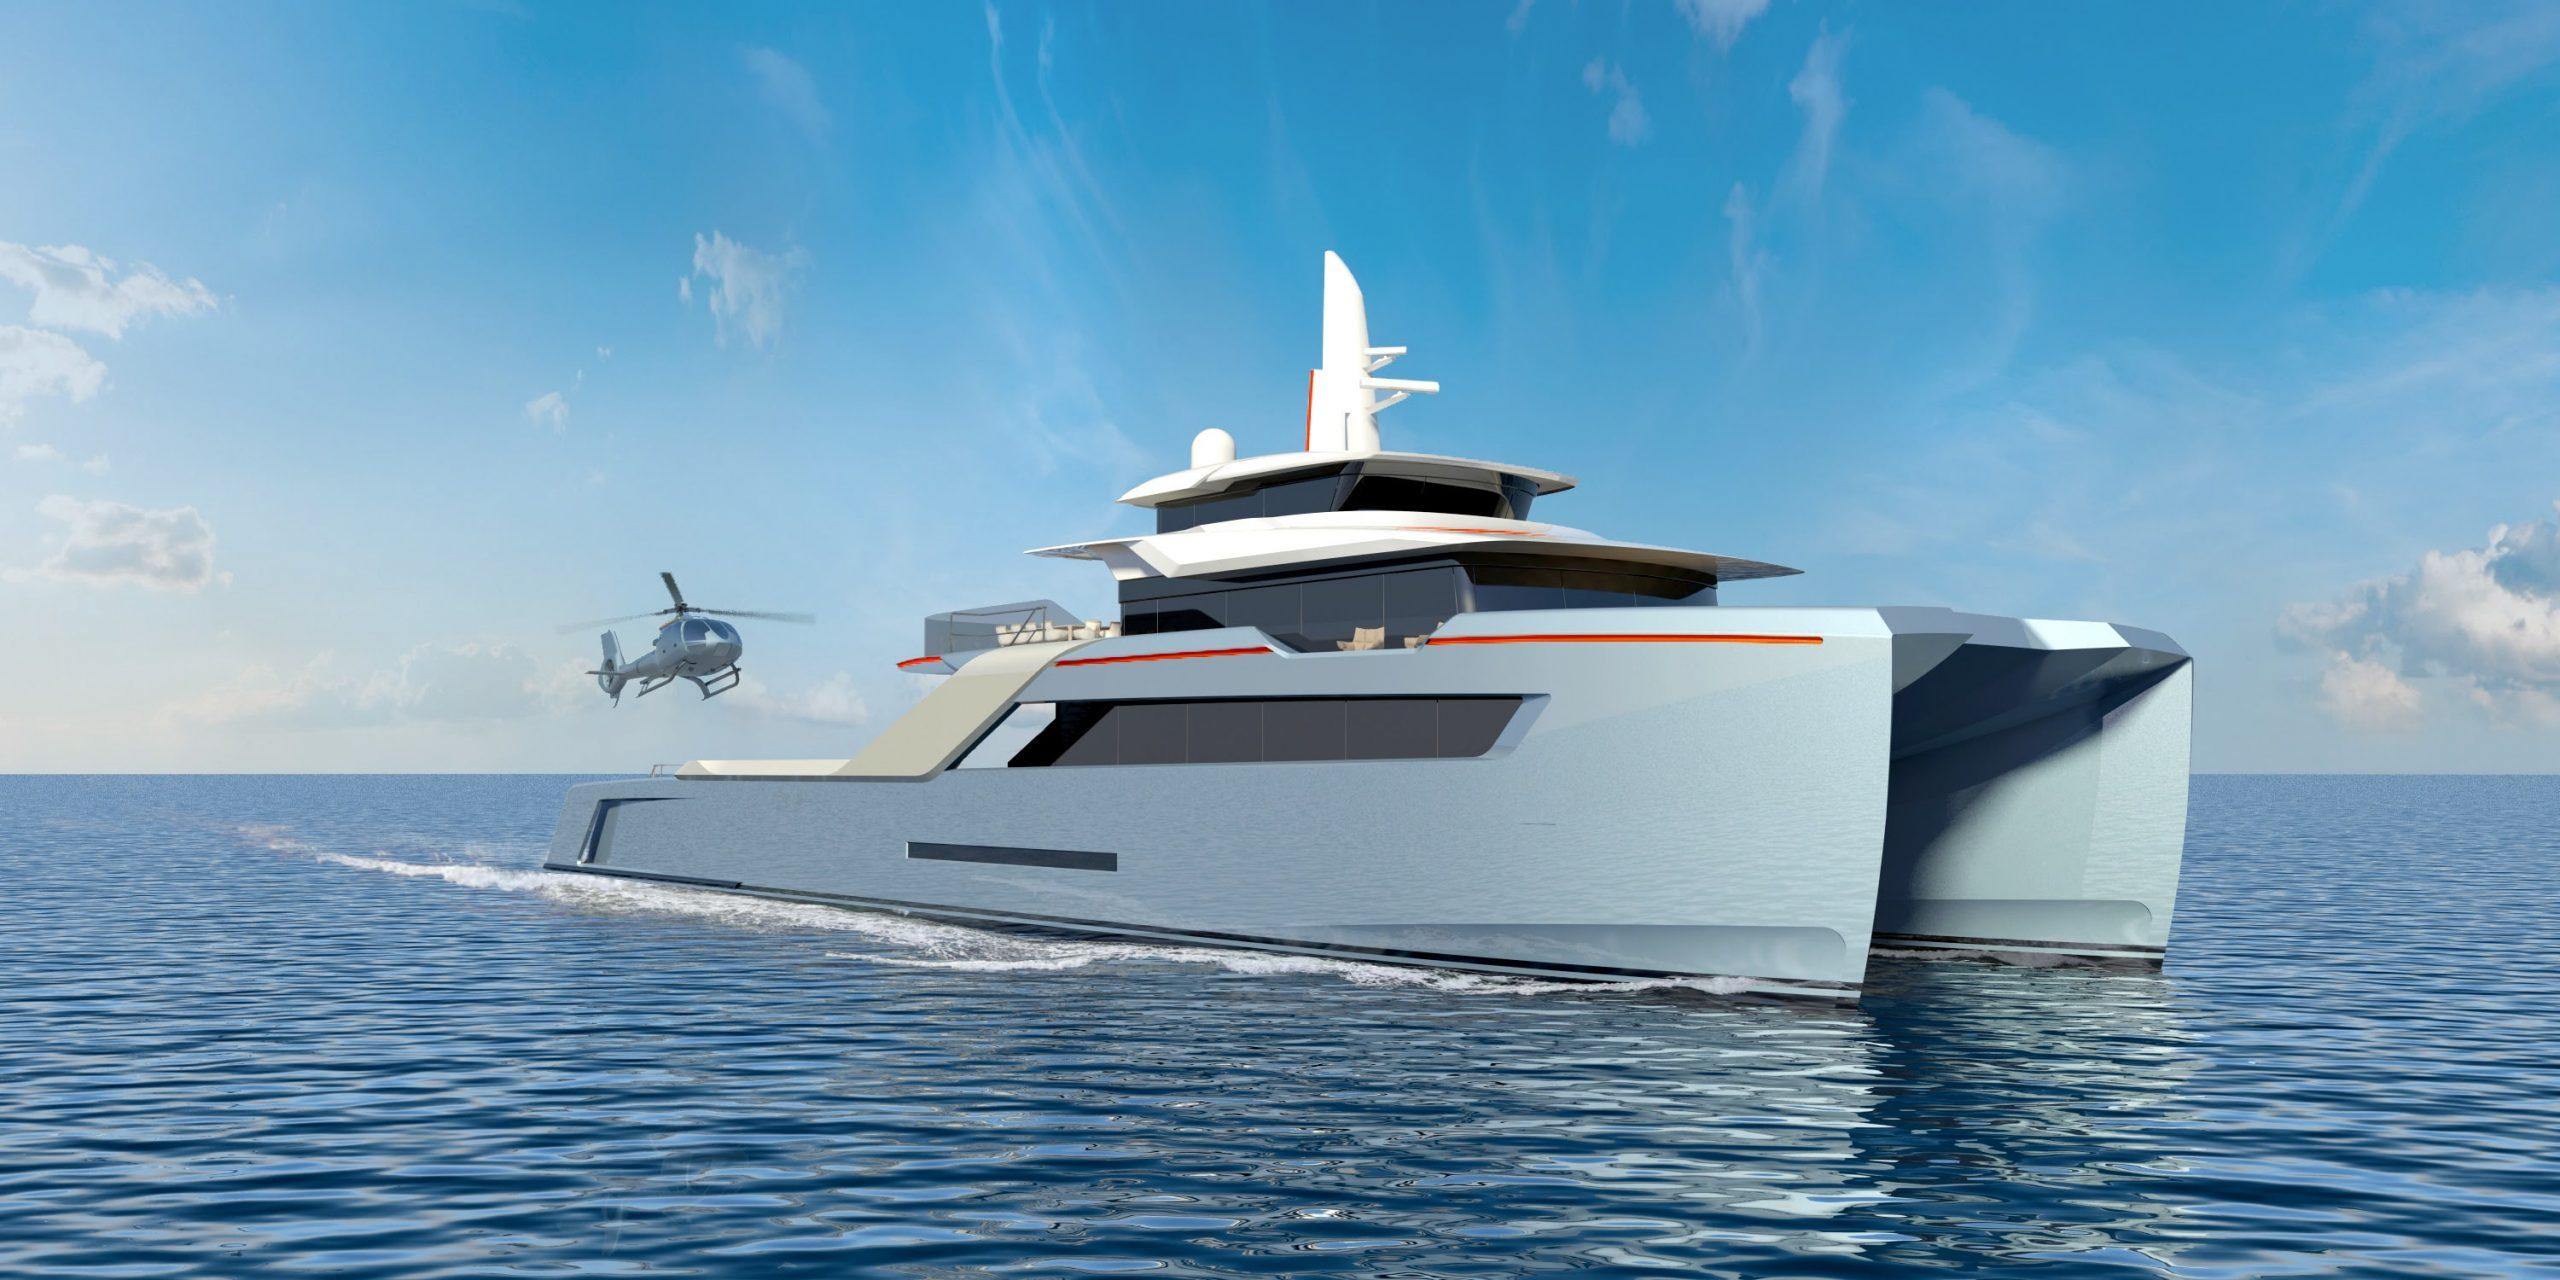 Echo Yachts Superiate HSV apoio humanitário - boat shopping